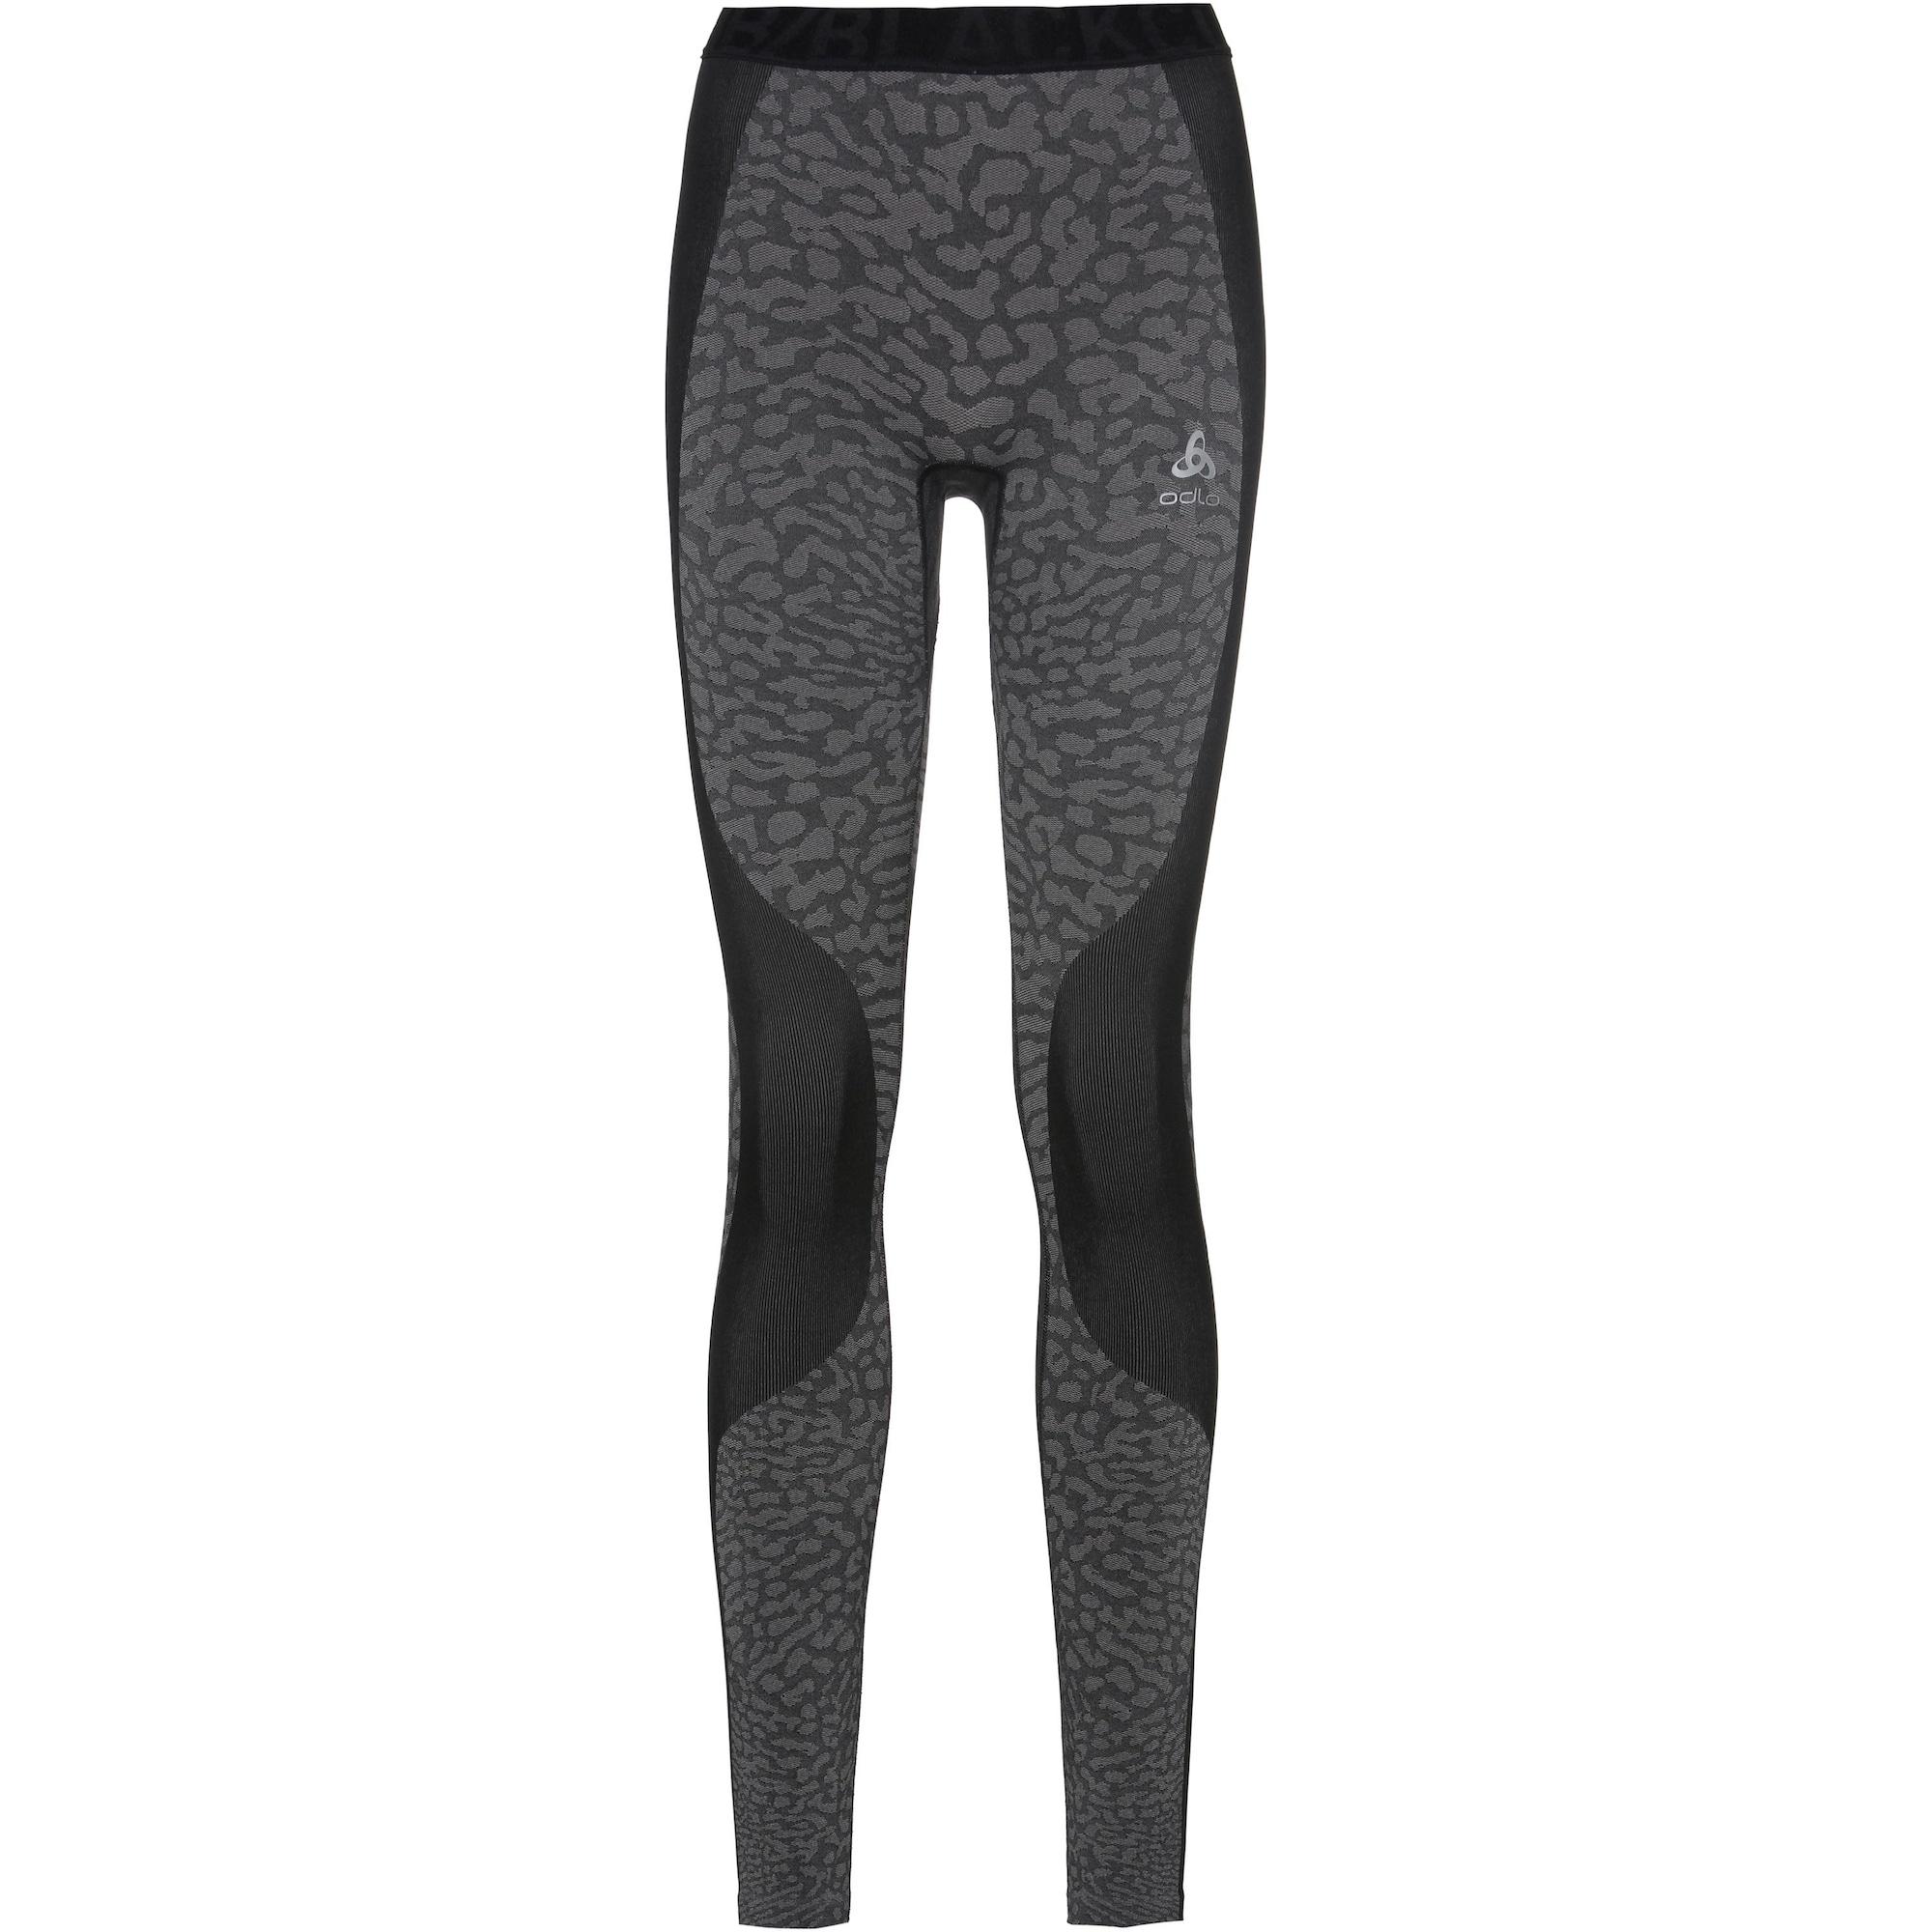 Funktionsunterhose   Sportbekleidung > Funktionswäsche > Thermoleggings   ODLO